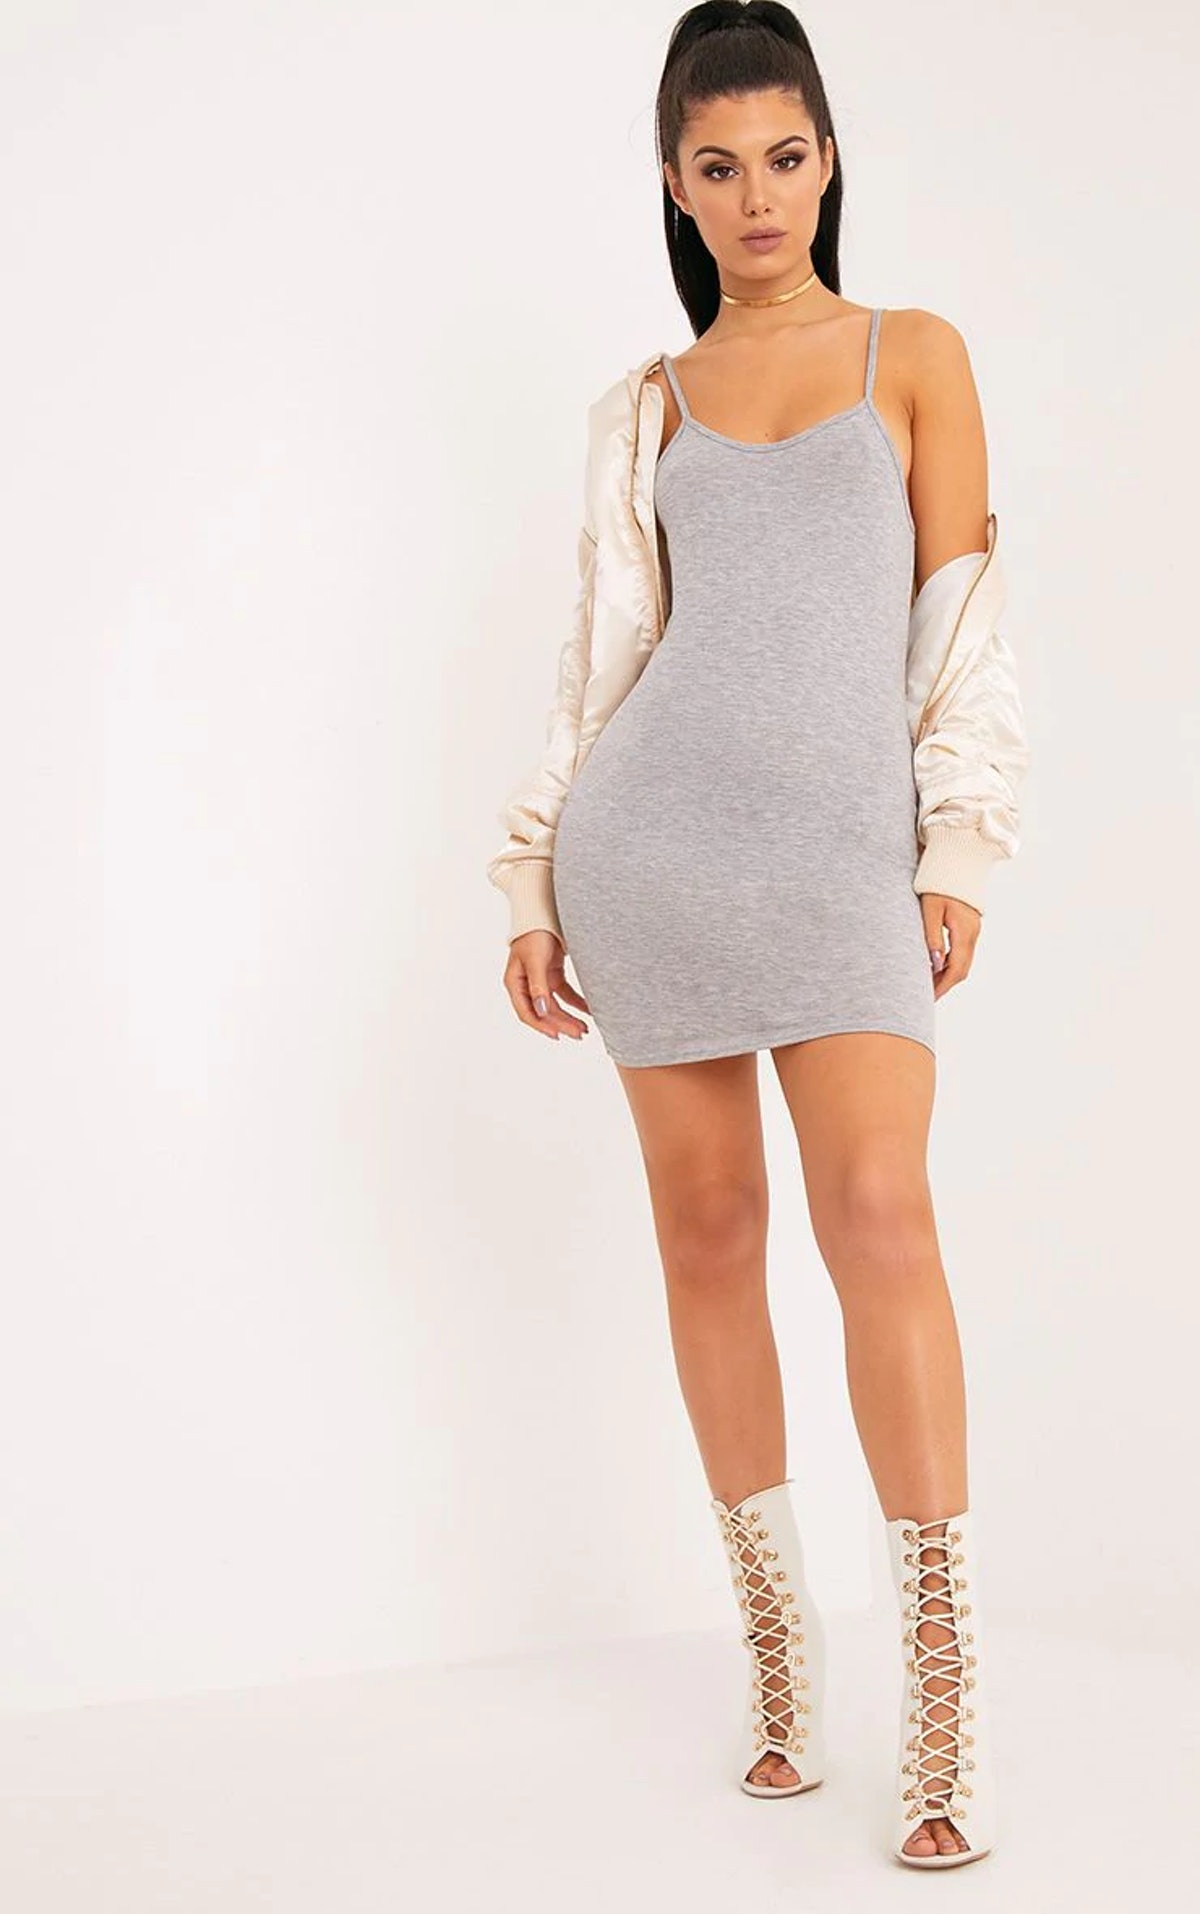 PrettyLittleThing Basic Grey Marl Strappy Scoop Neck Bodycon Dress